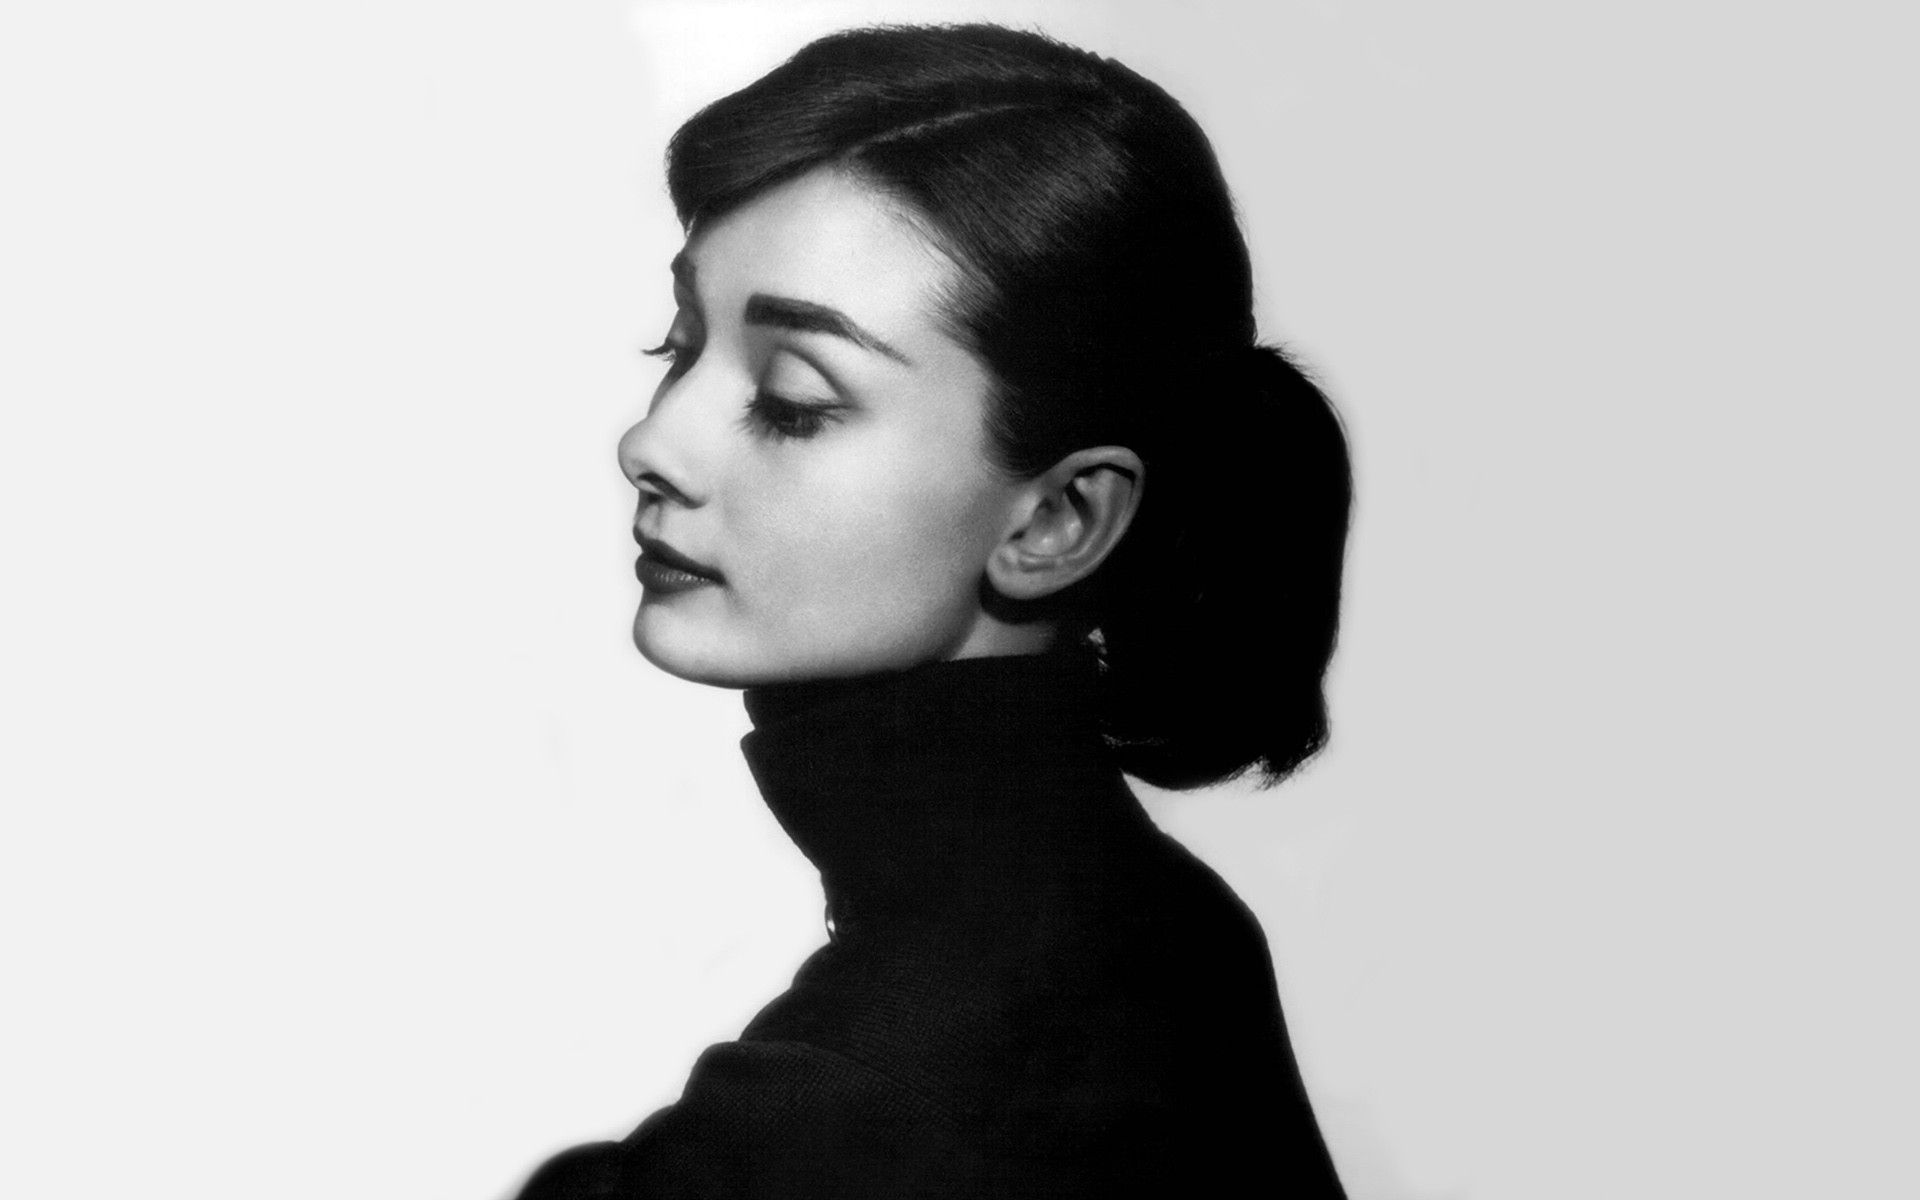 Audrey Hepburn Wallpapers   Full HD wallpaper search 1920x1200